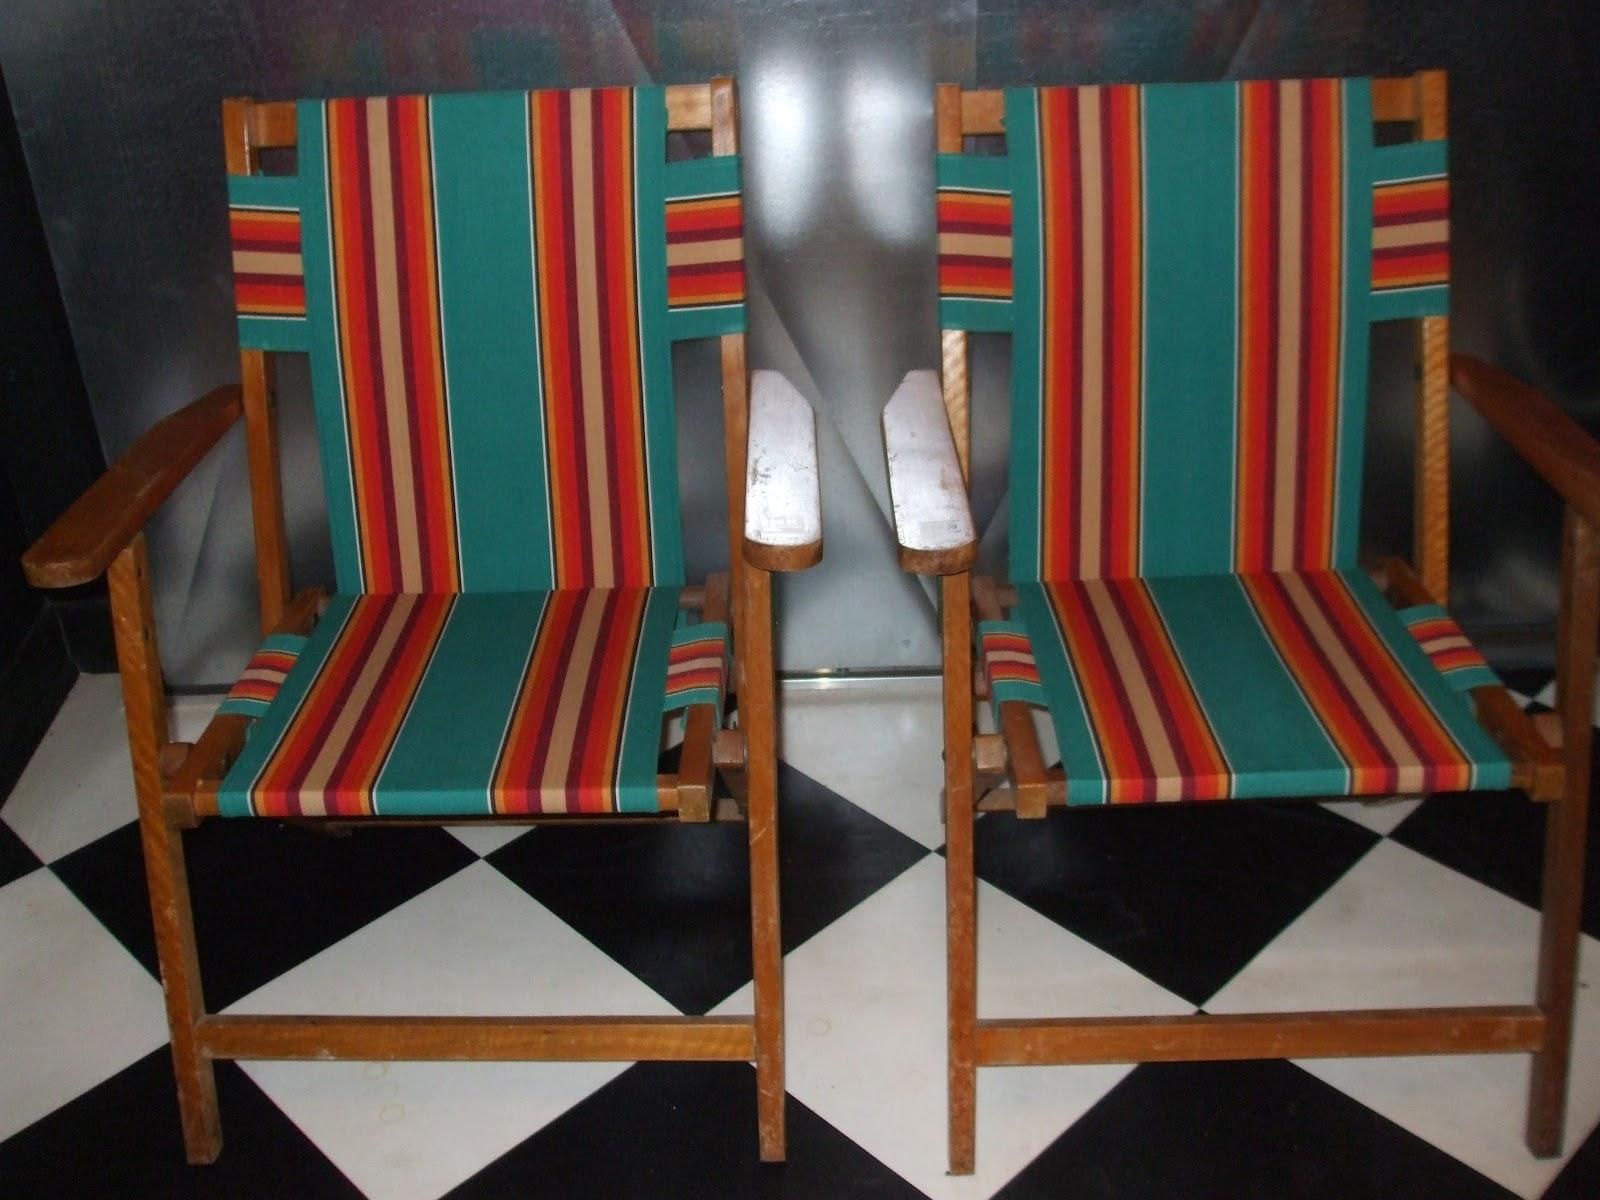 2.bp.blogspot.com_-1Sgg_L_lRZE_UJL9ptPC0II_AAAAAAAABps_EHuweWvTWEc_s1600_deck+chairs+003